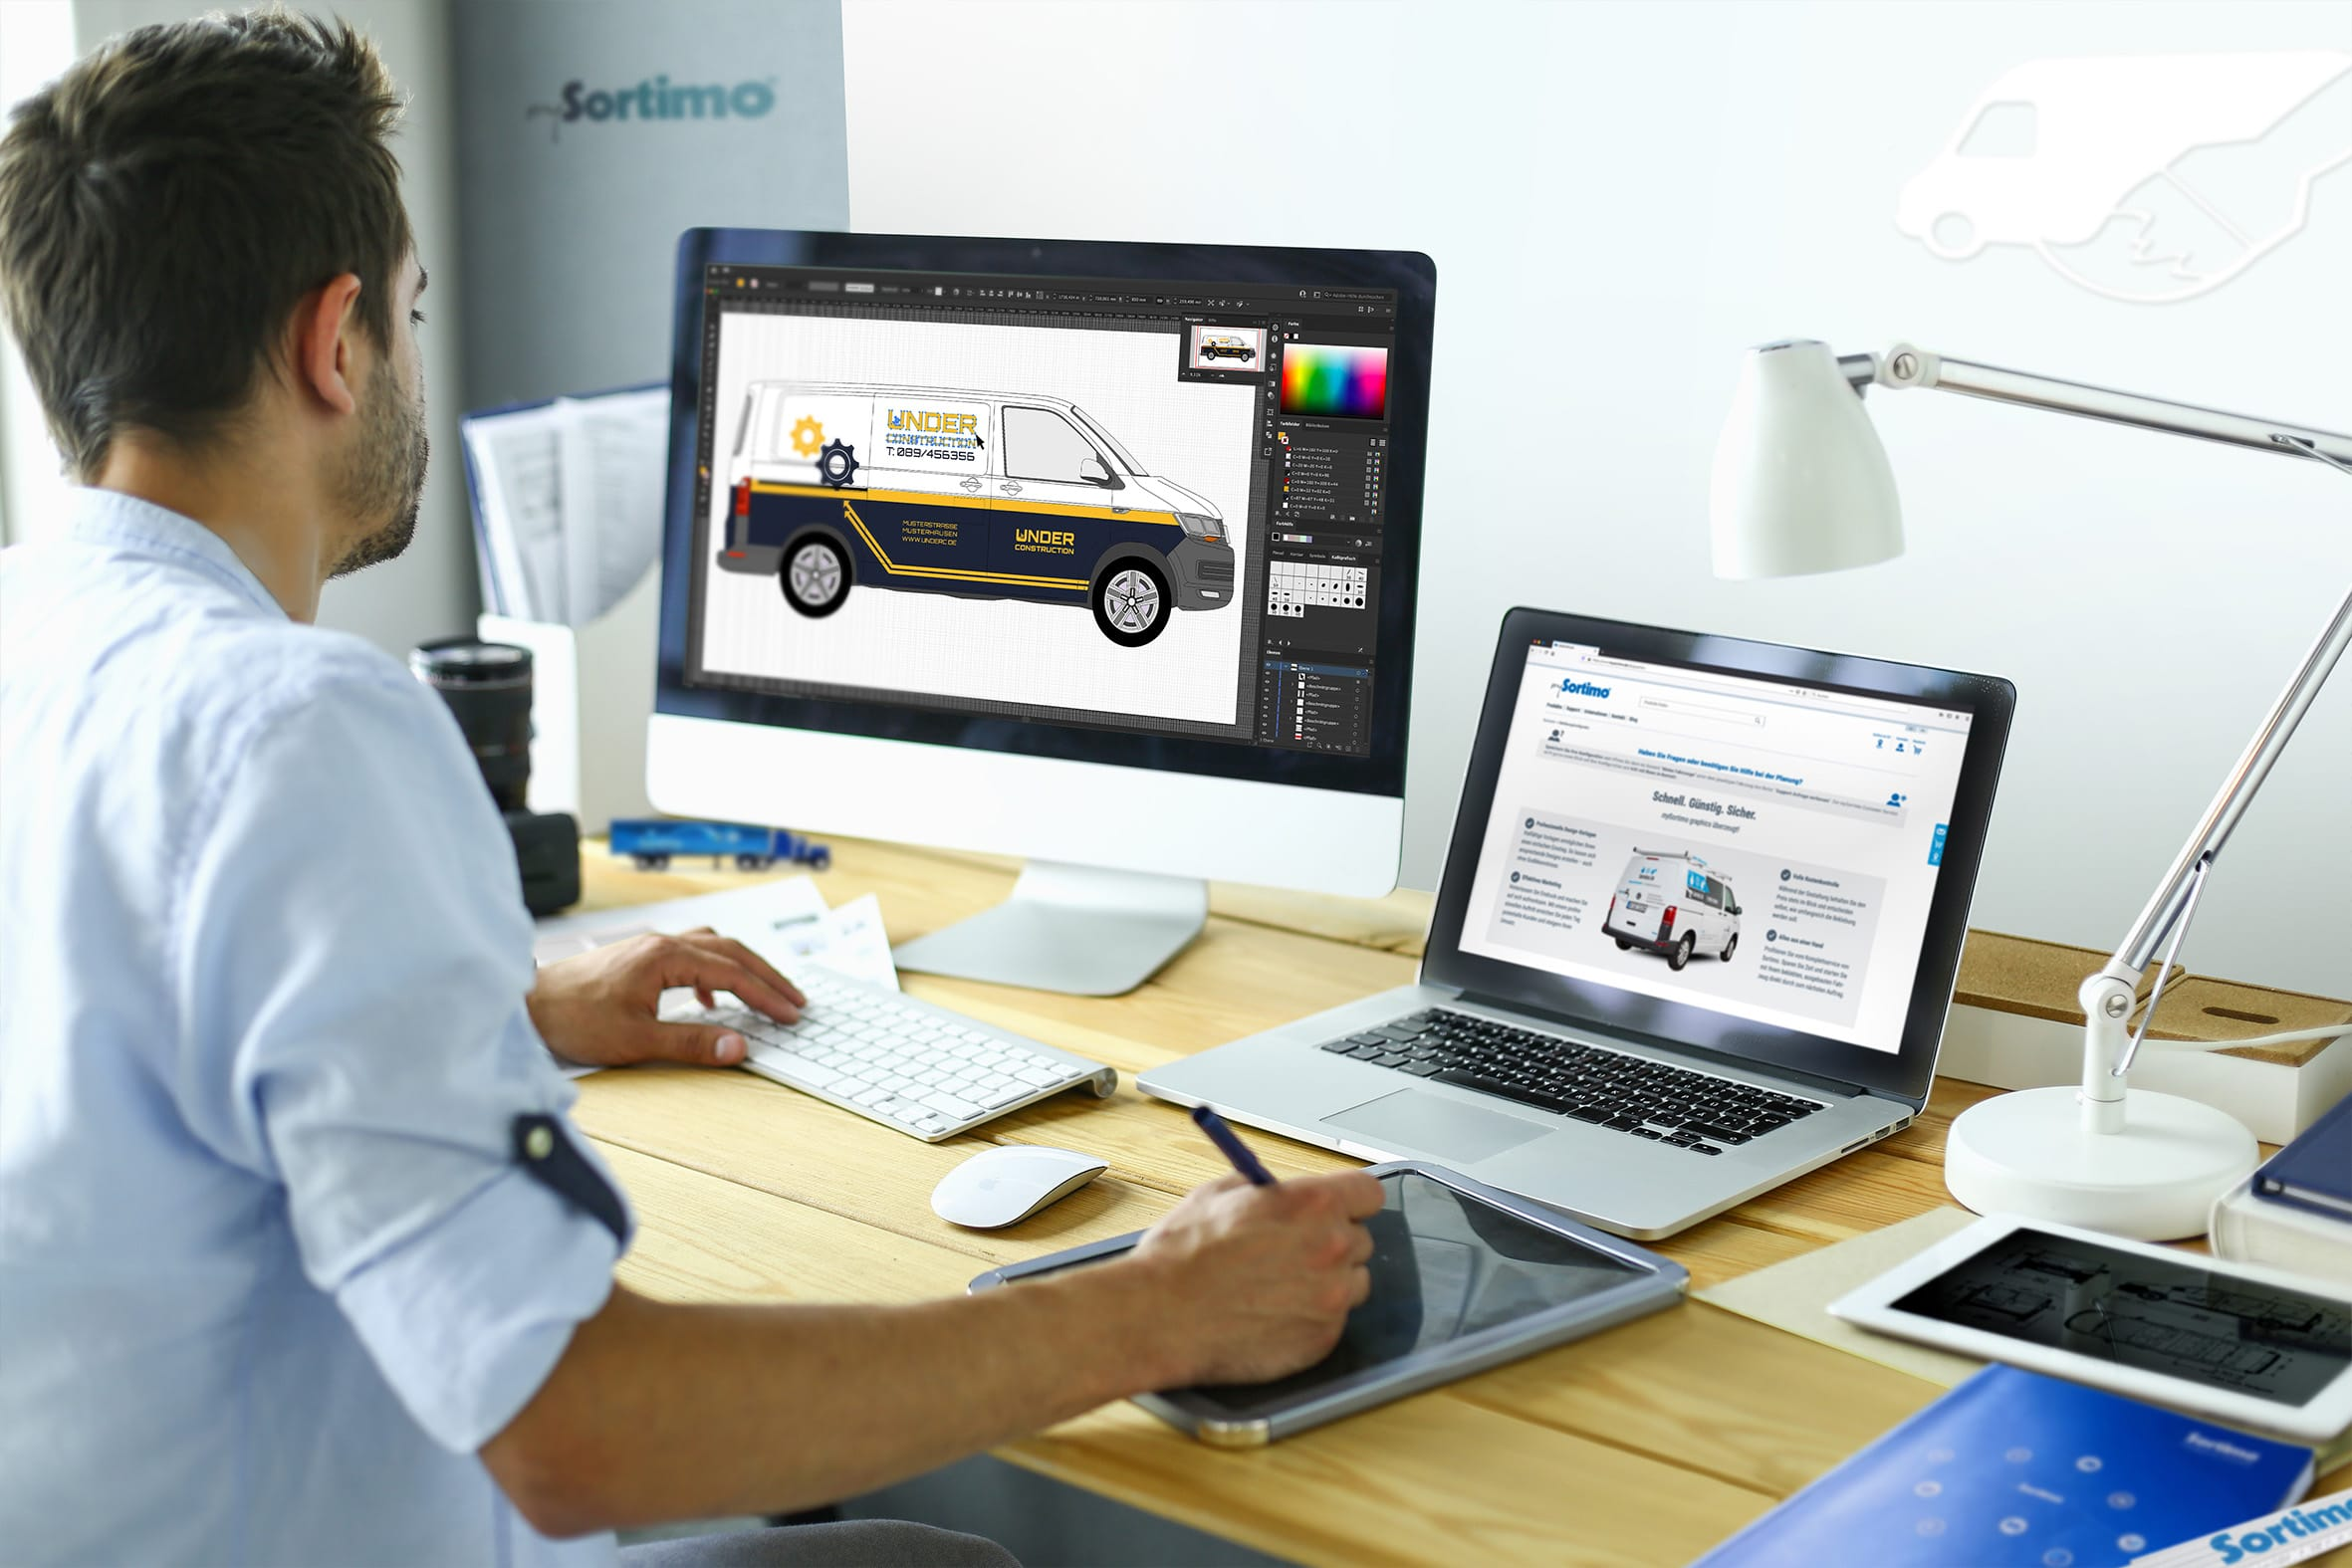 Fahrzeugbeklebung: Sortimo bietet Branding vom Profi